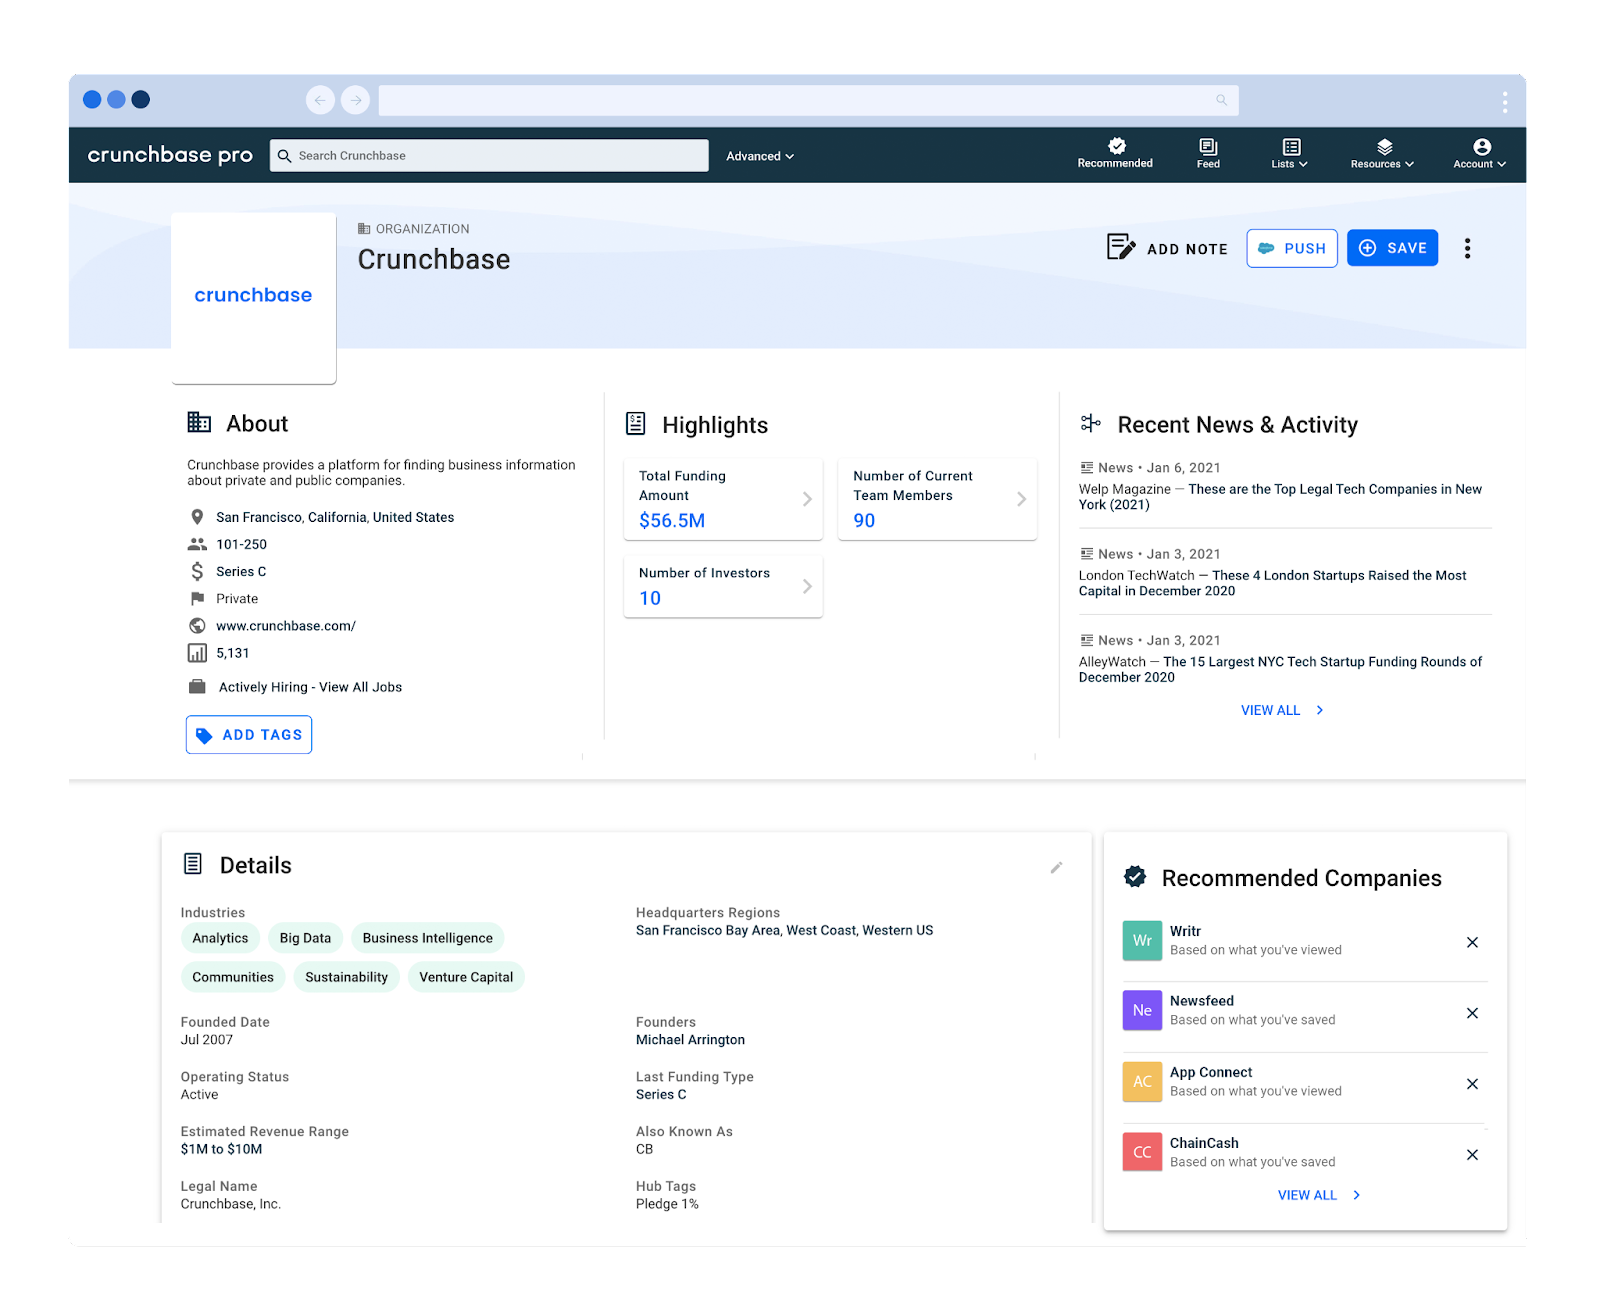 Crunchbase company profile screenshot with company description